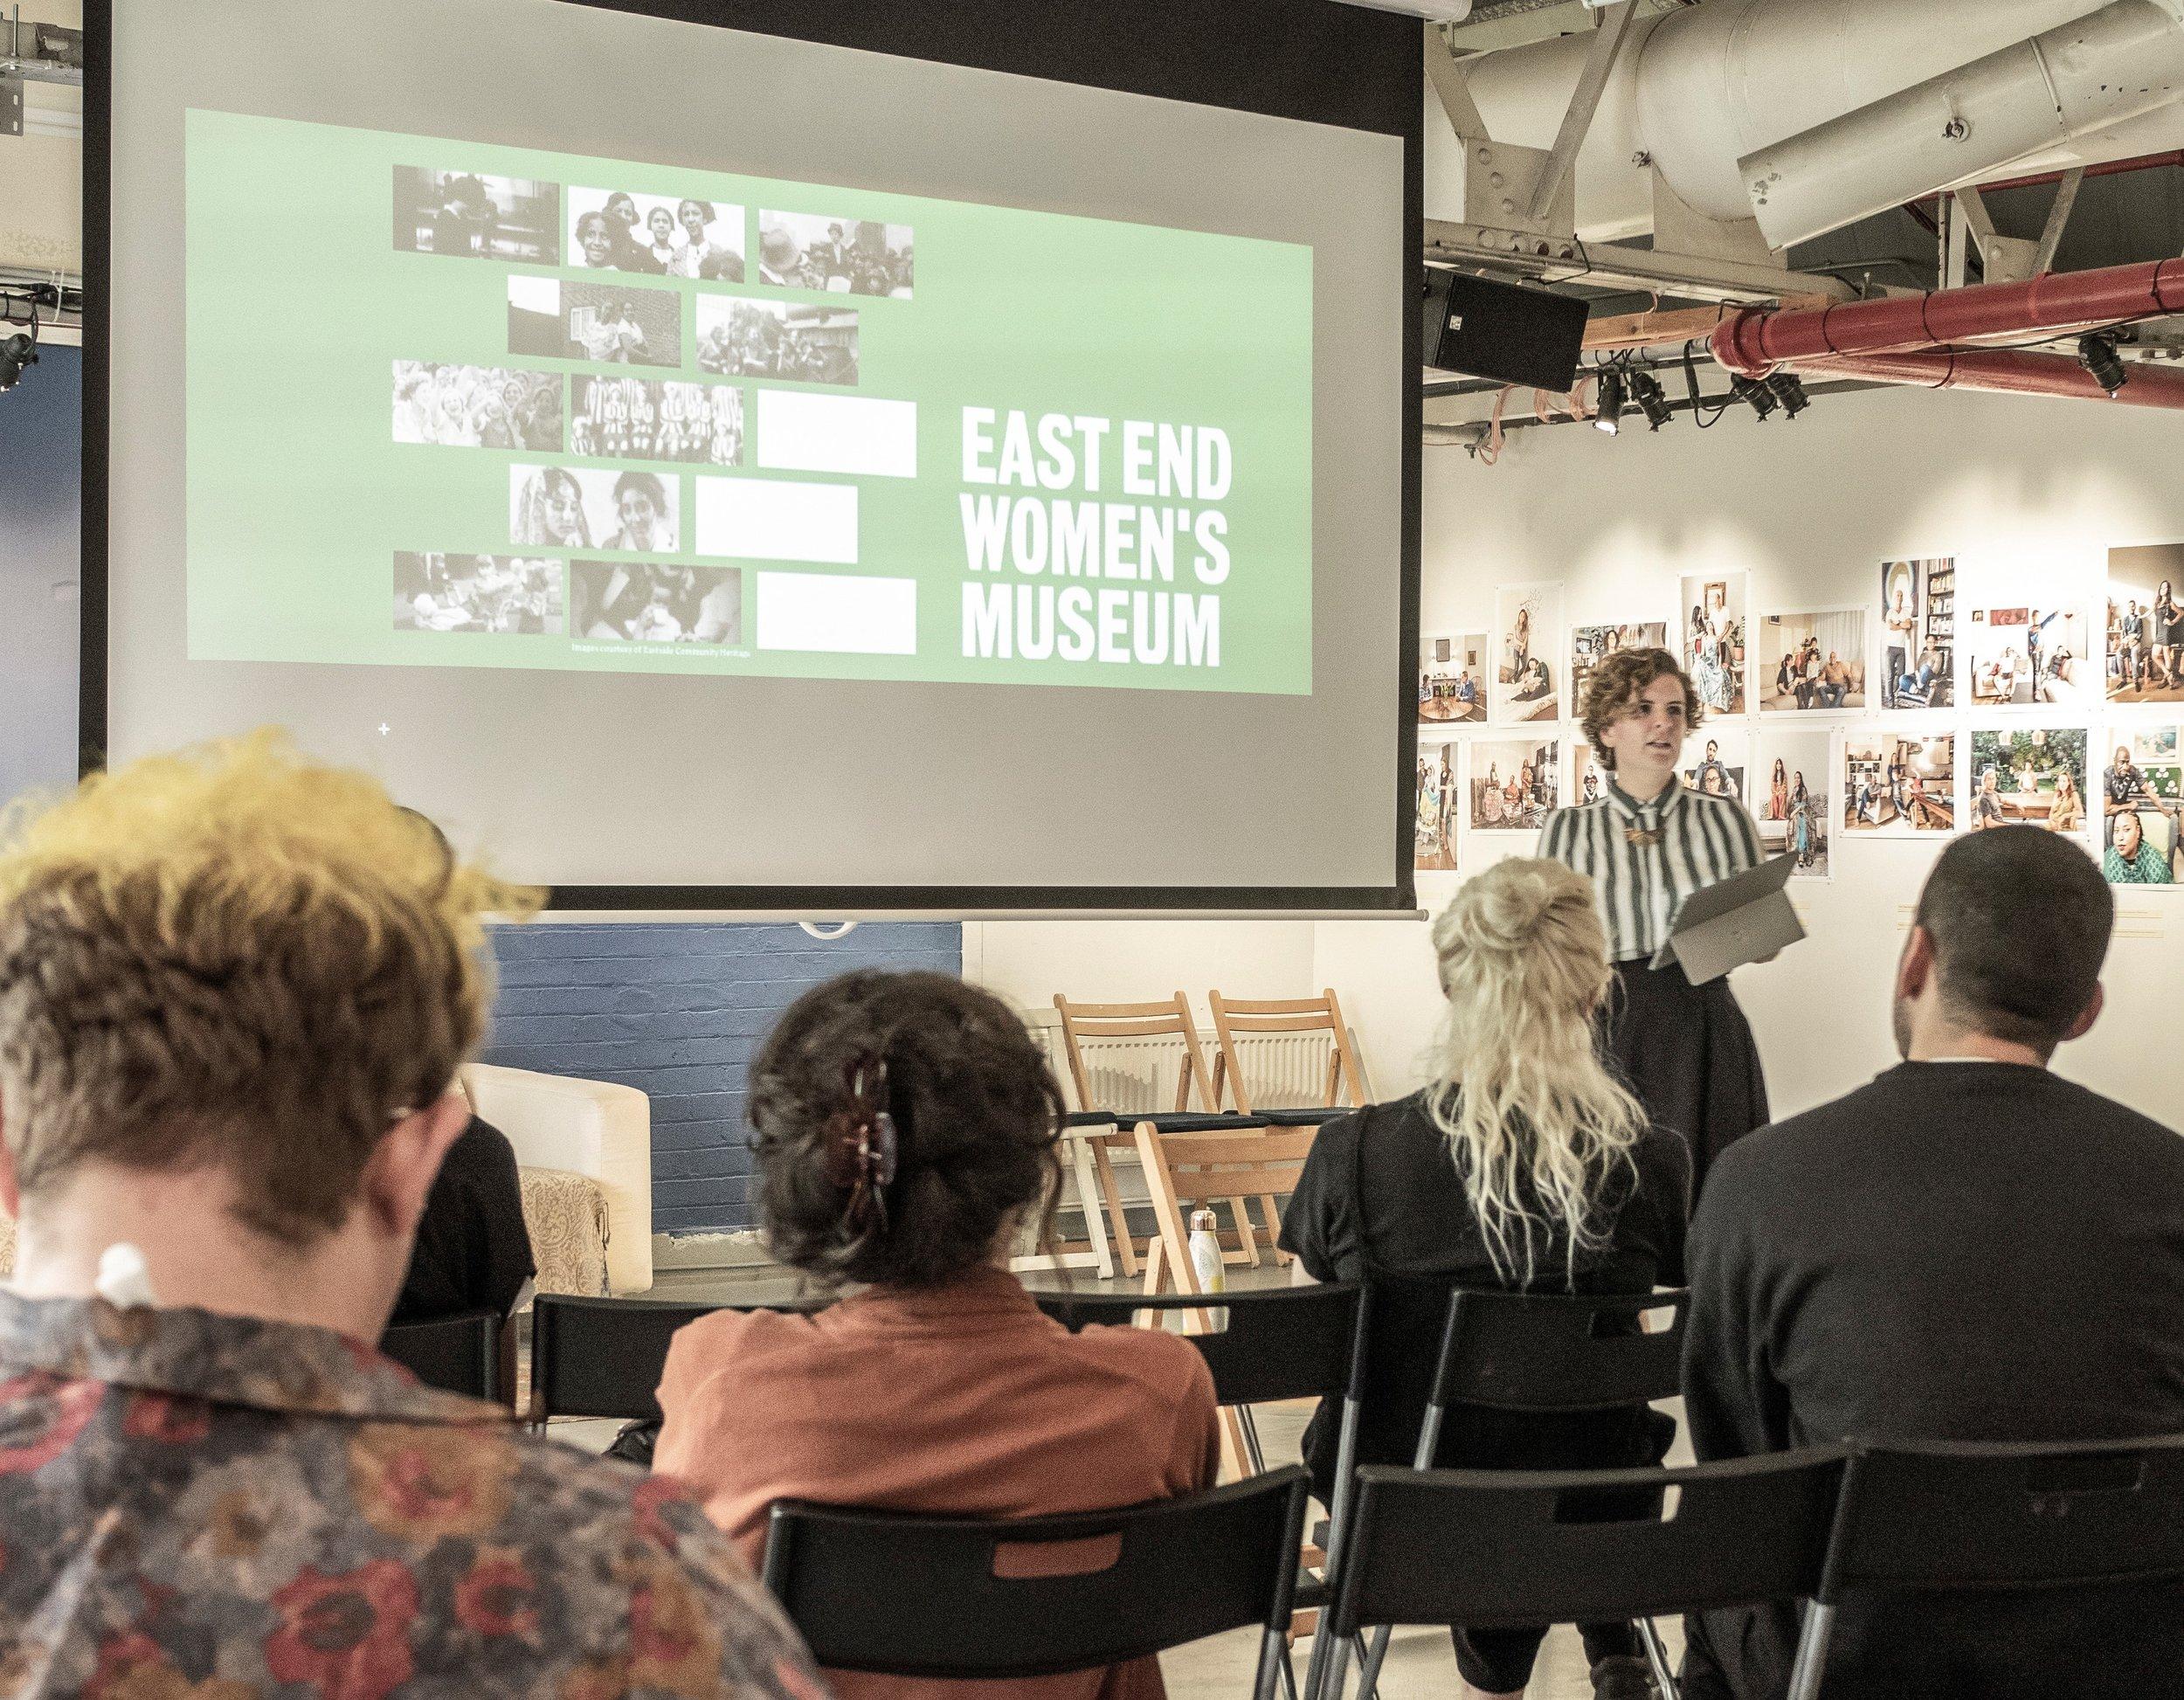 Rachel Crossley, Museum Director, presenting at a symposium (c) Debbie Sears